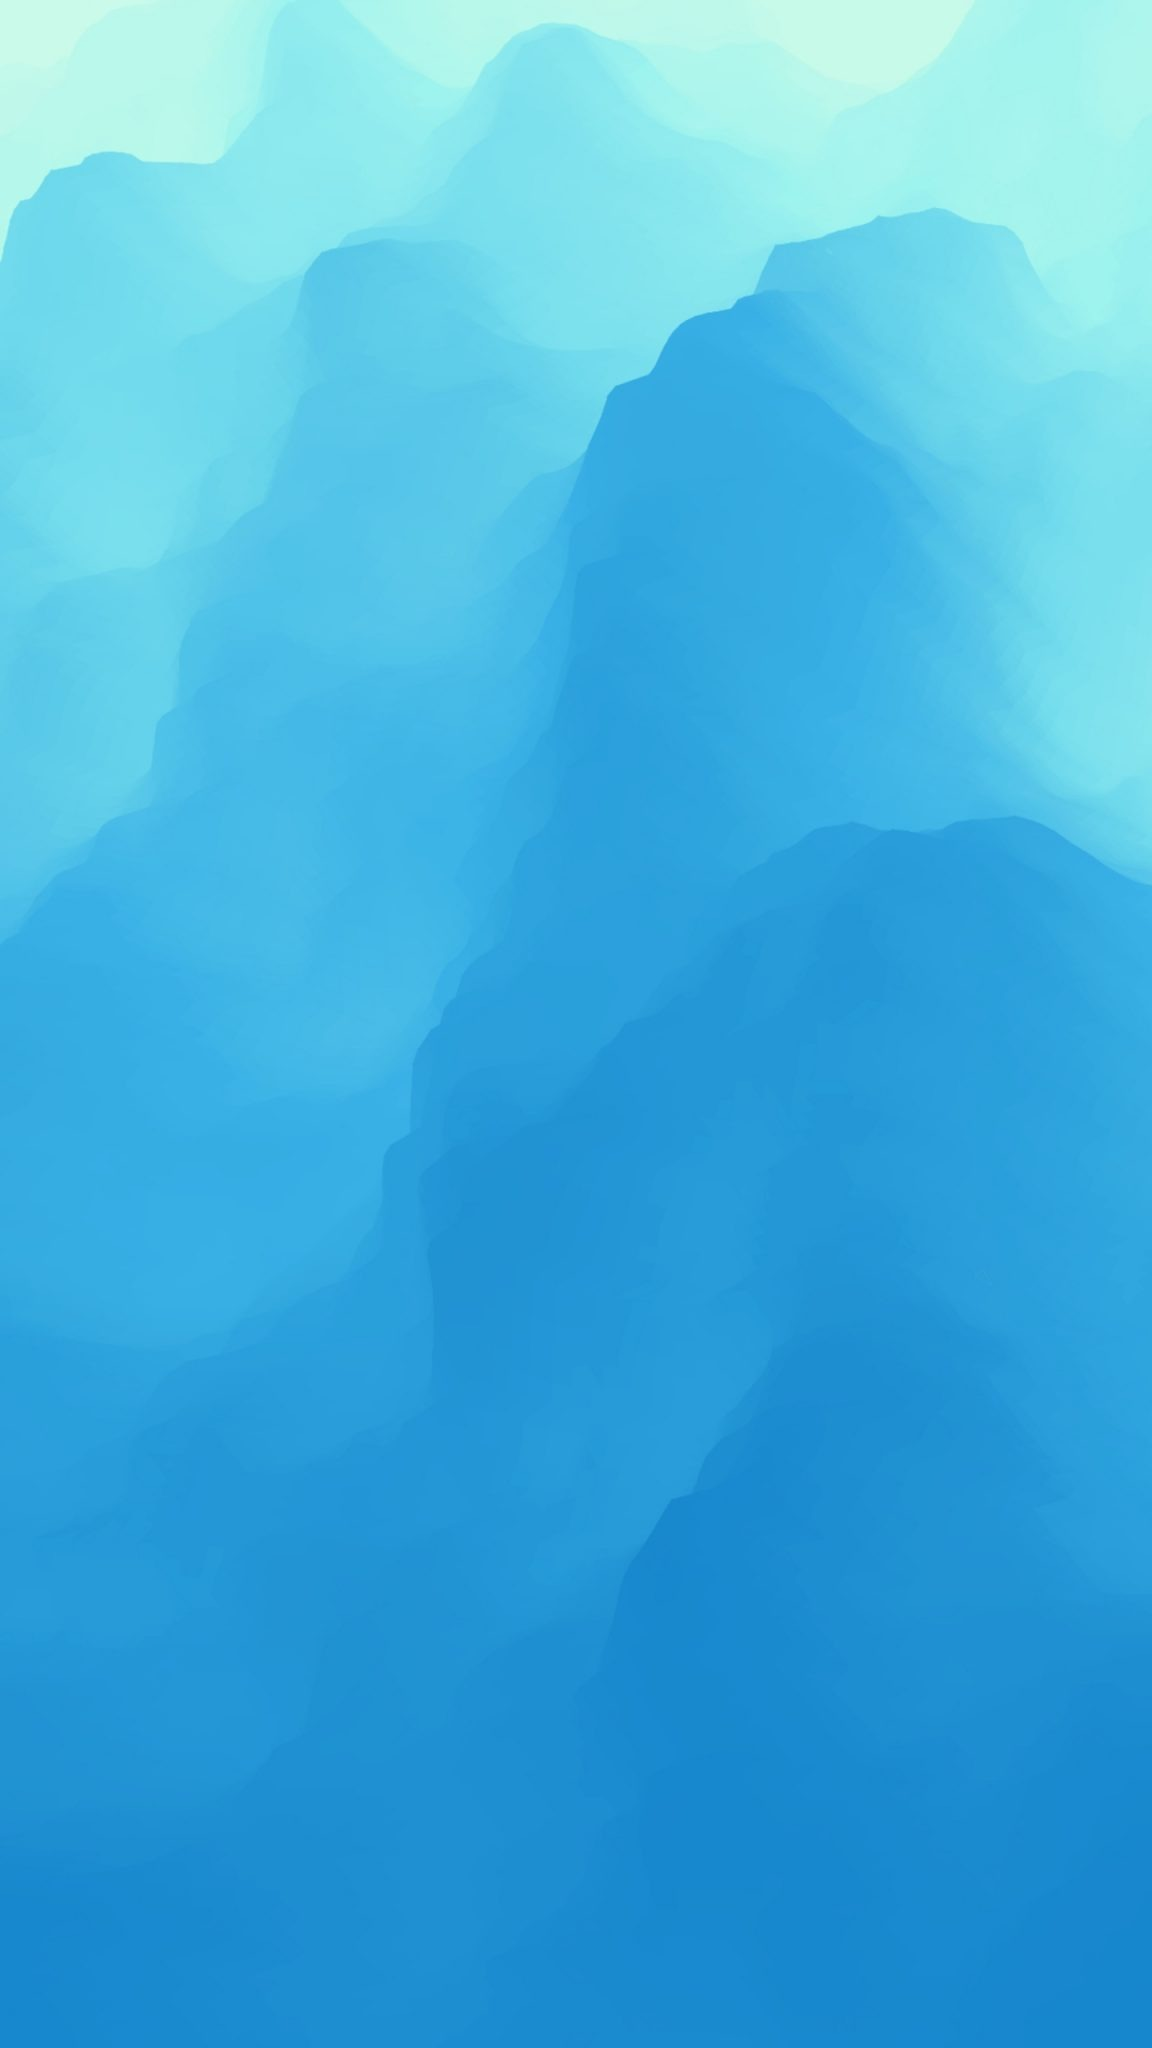 Download Meizu 16 Stock Wallpapers - ZIP File Included 8